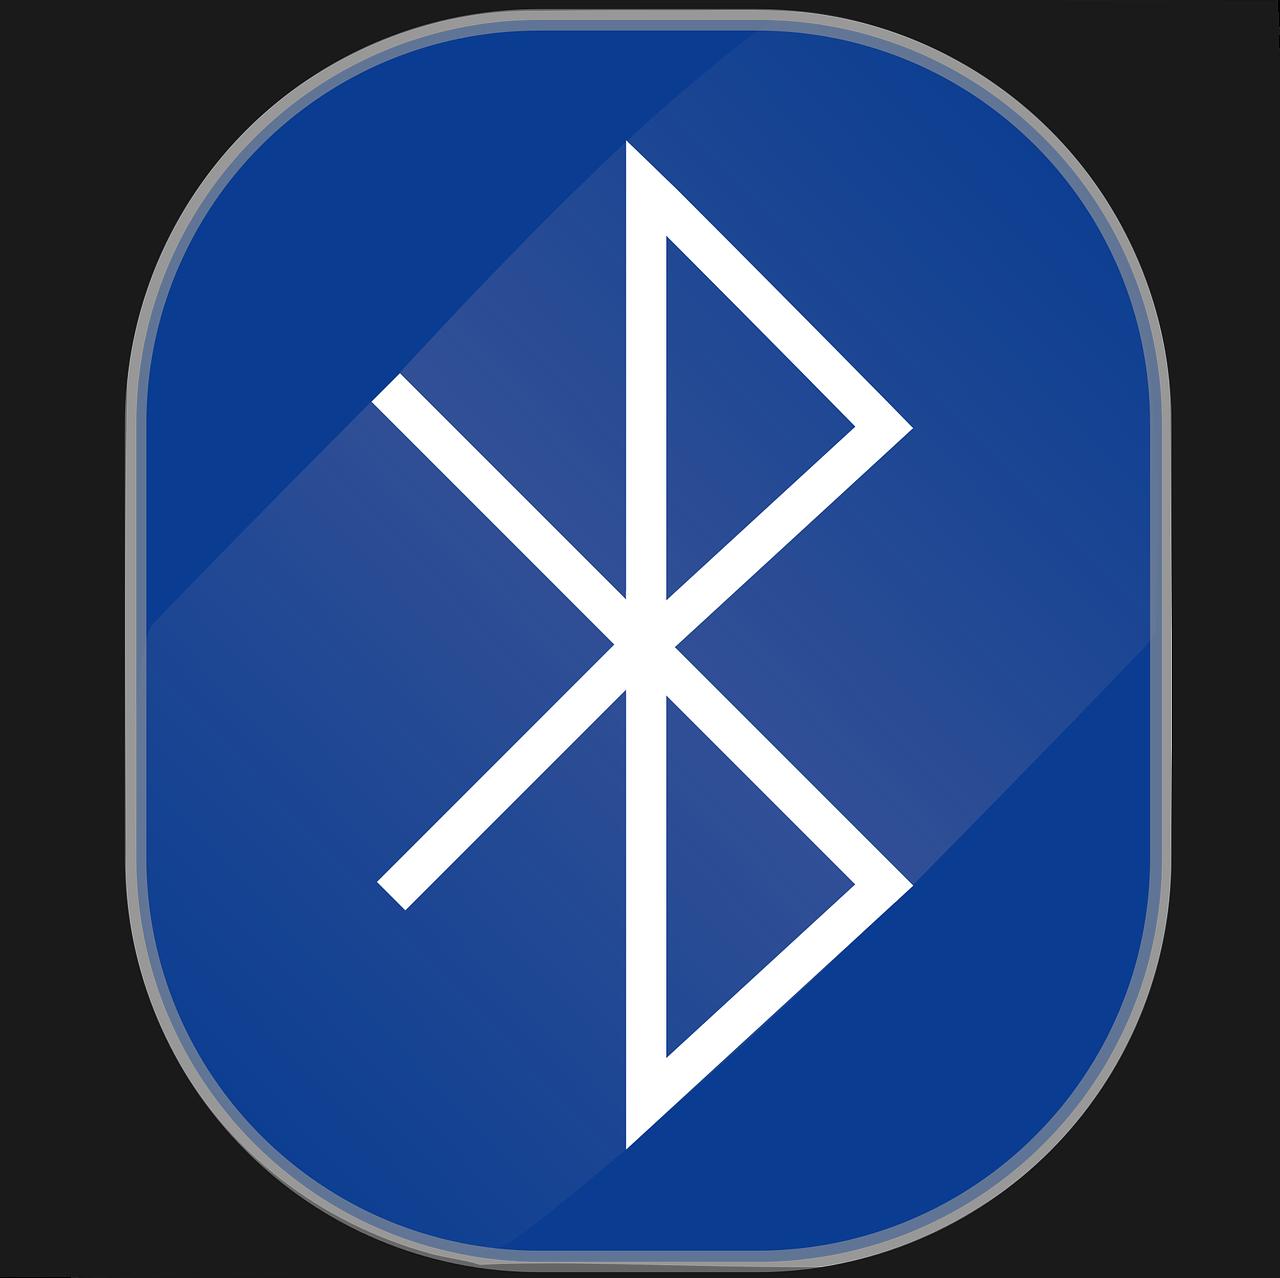 bluetooth-1330140_1280